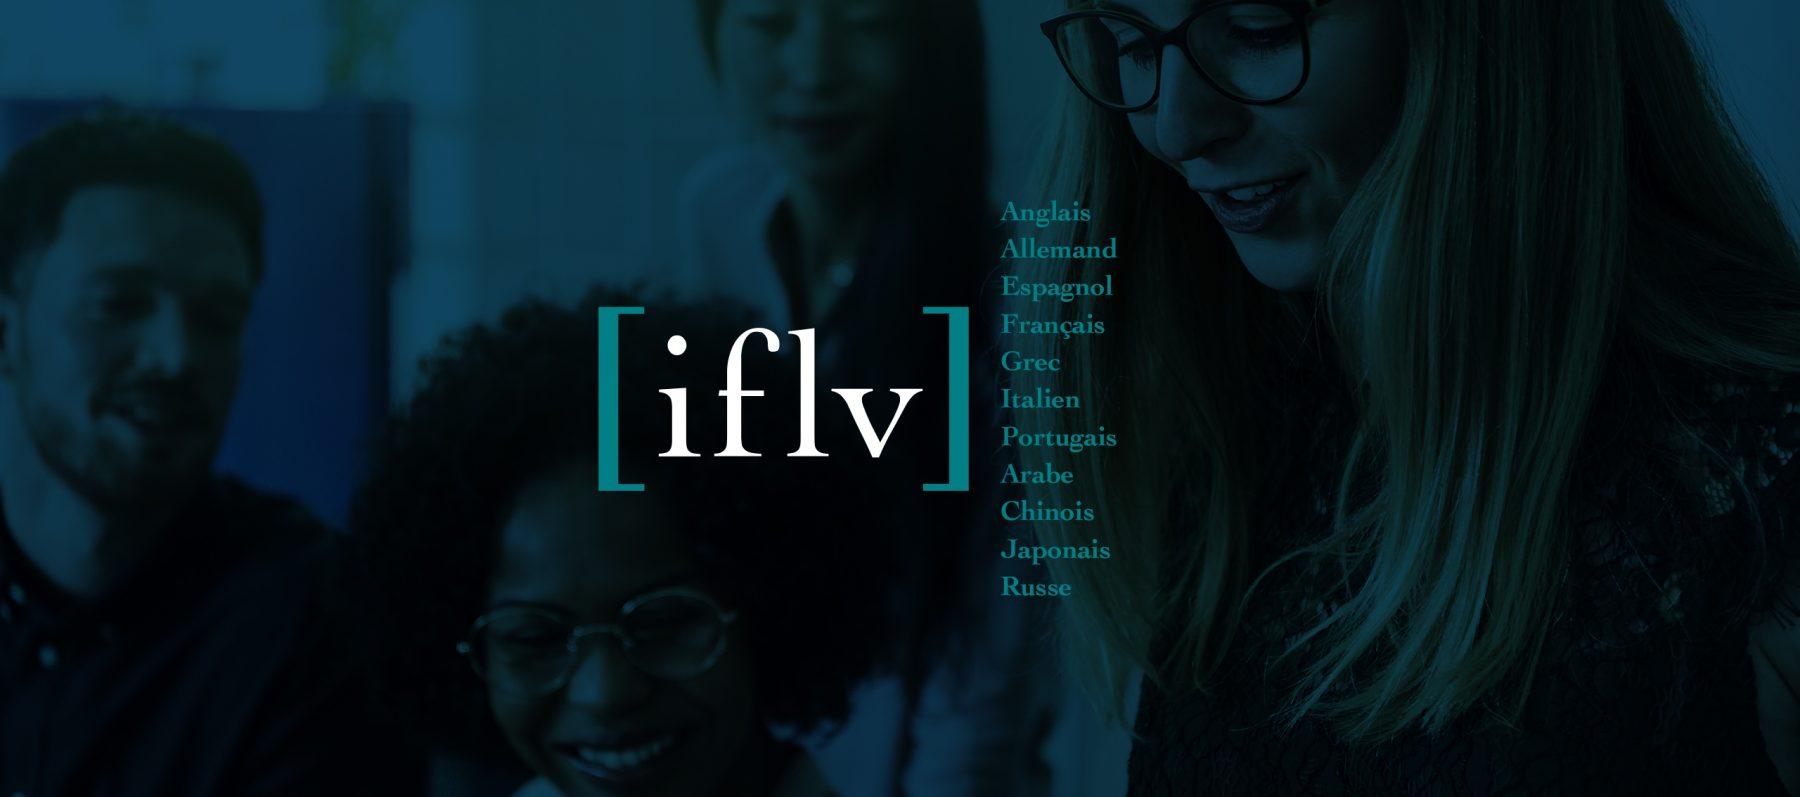 logo IFLV institut de formations en langues vivantes